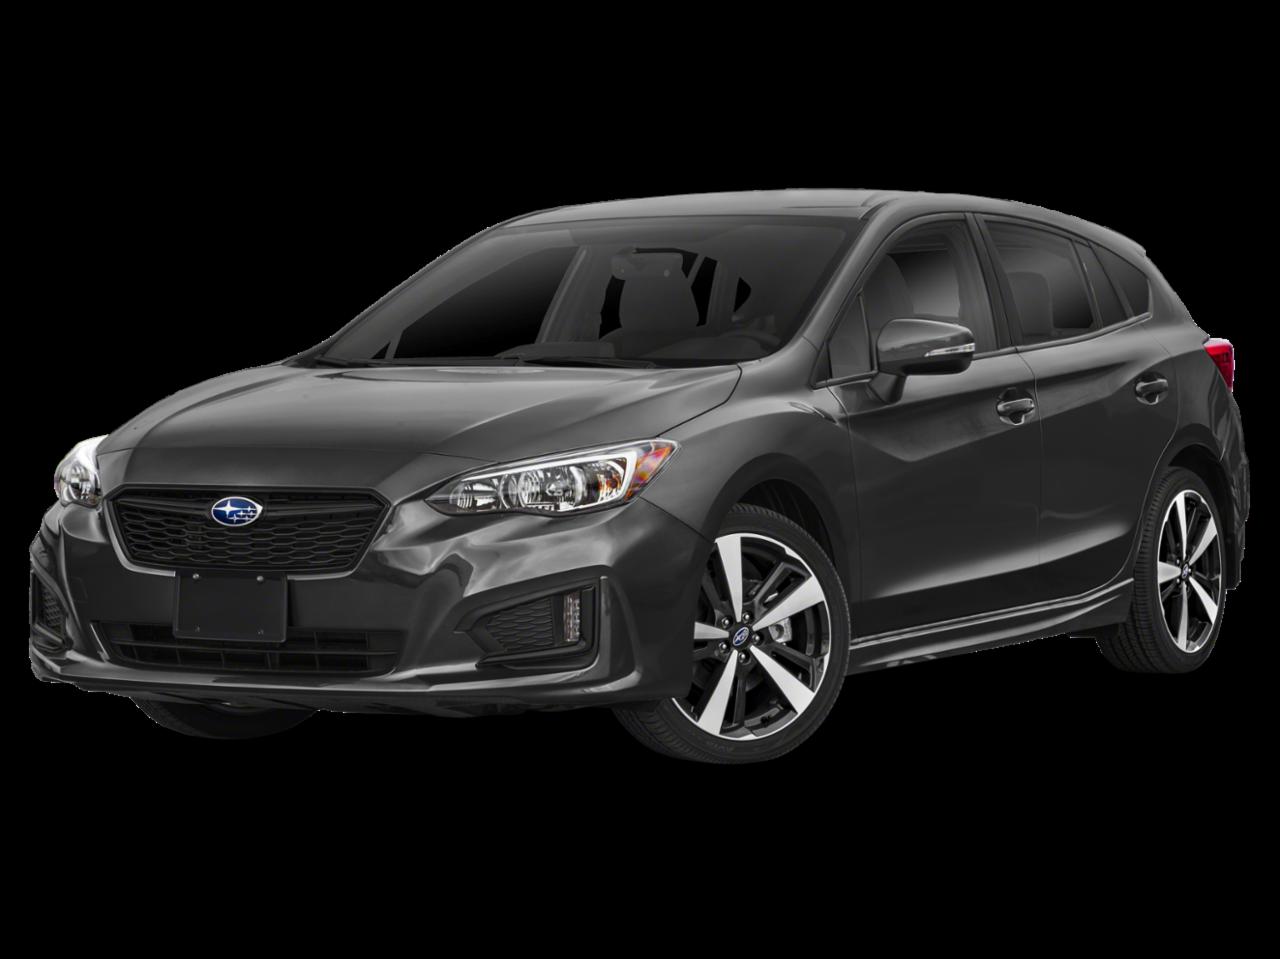 2019 Subaru Impreza 2.0i Sport Hatchback